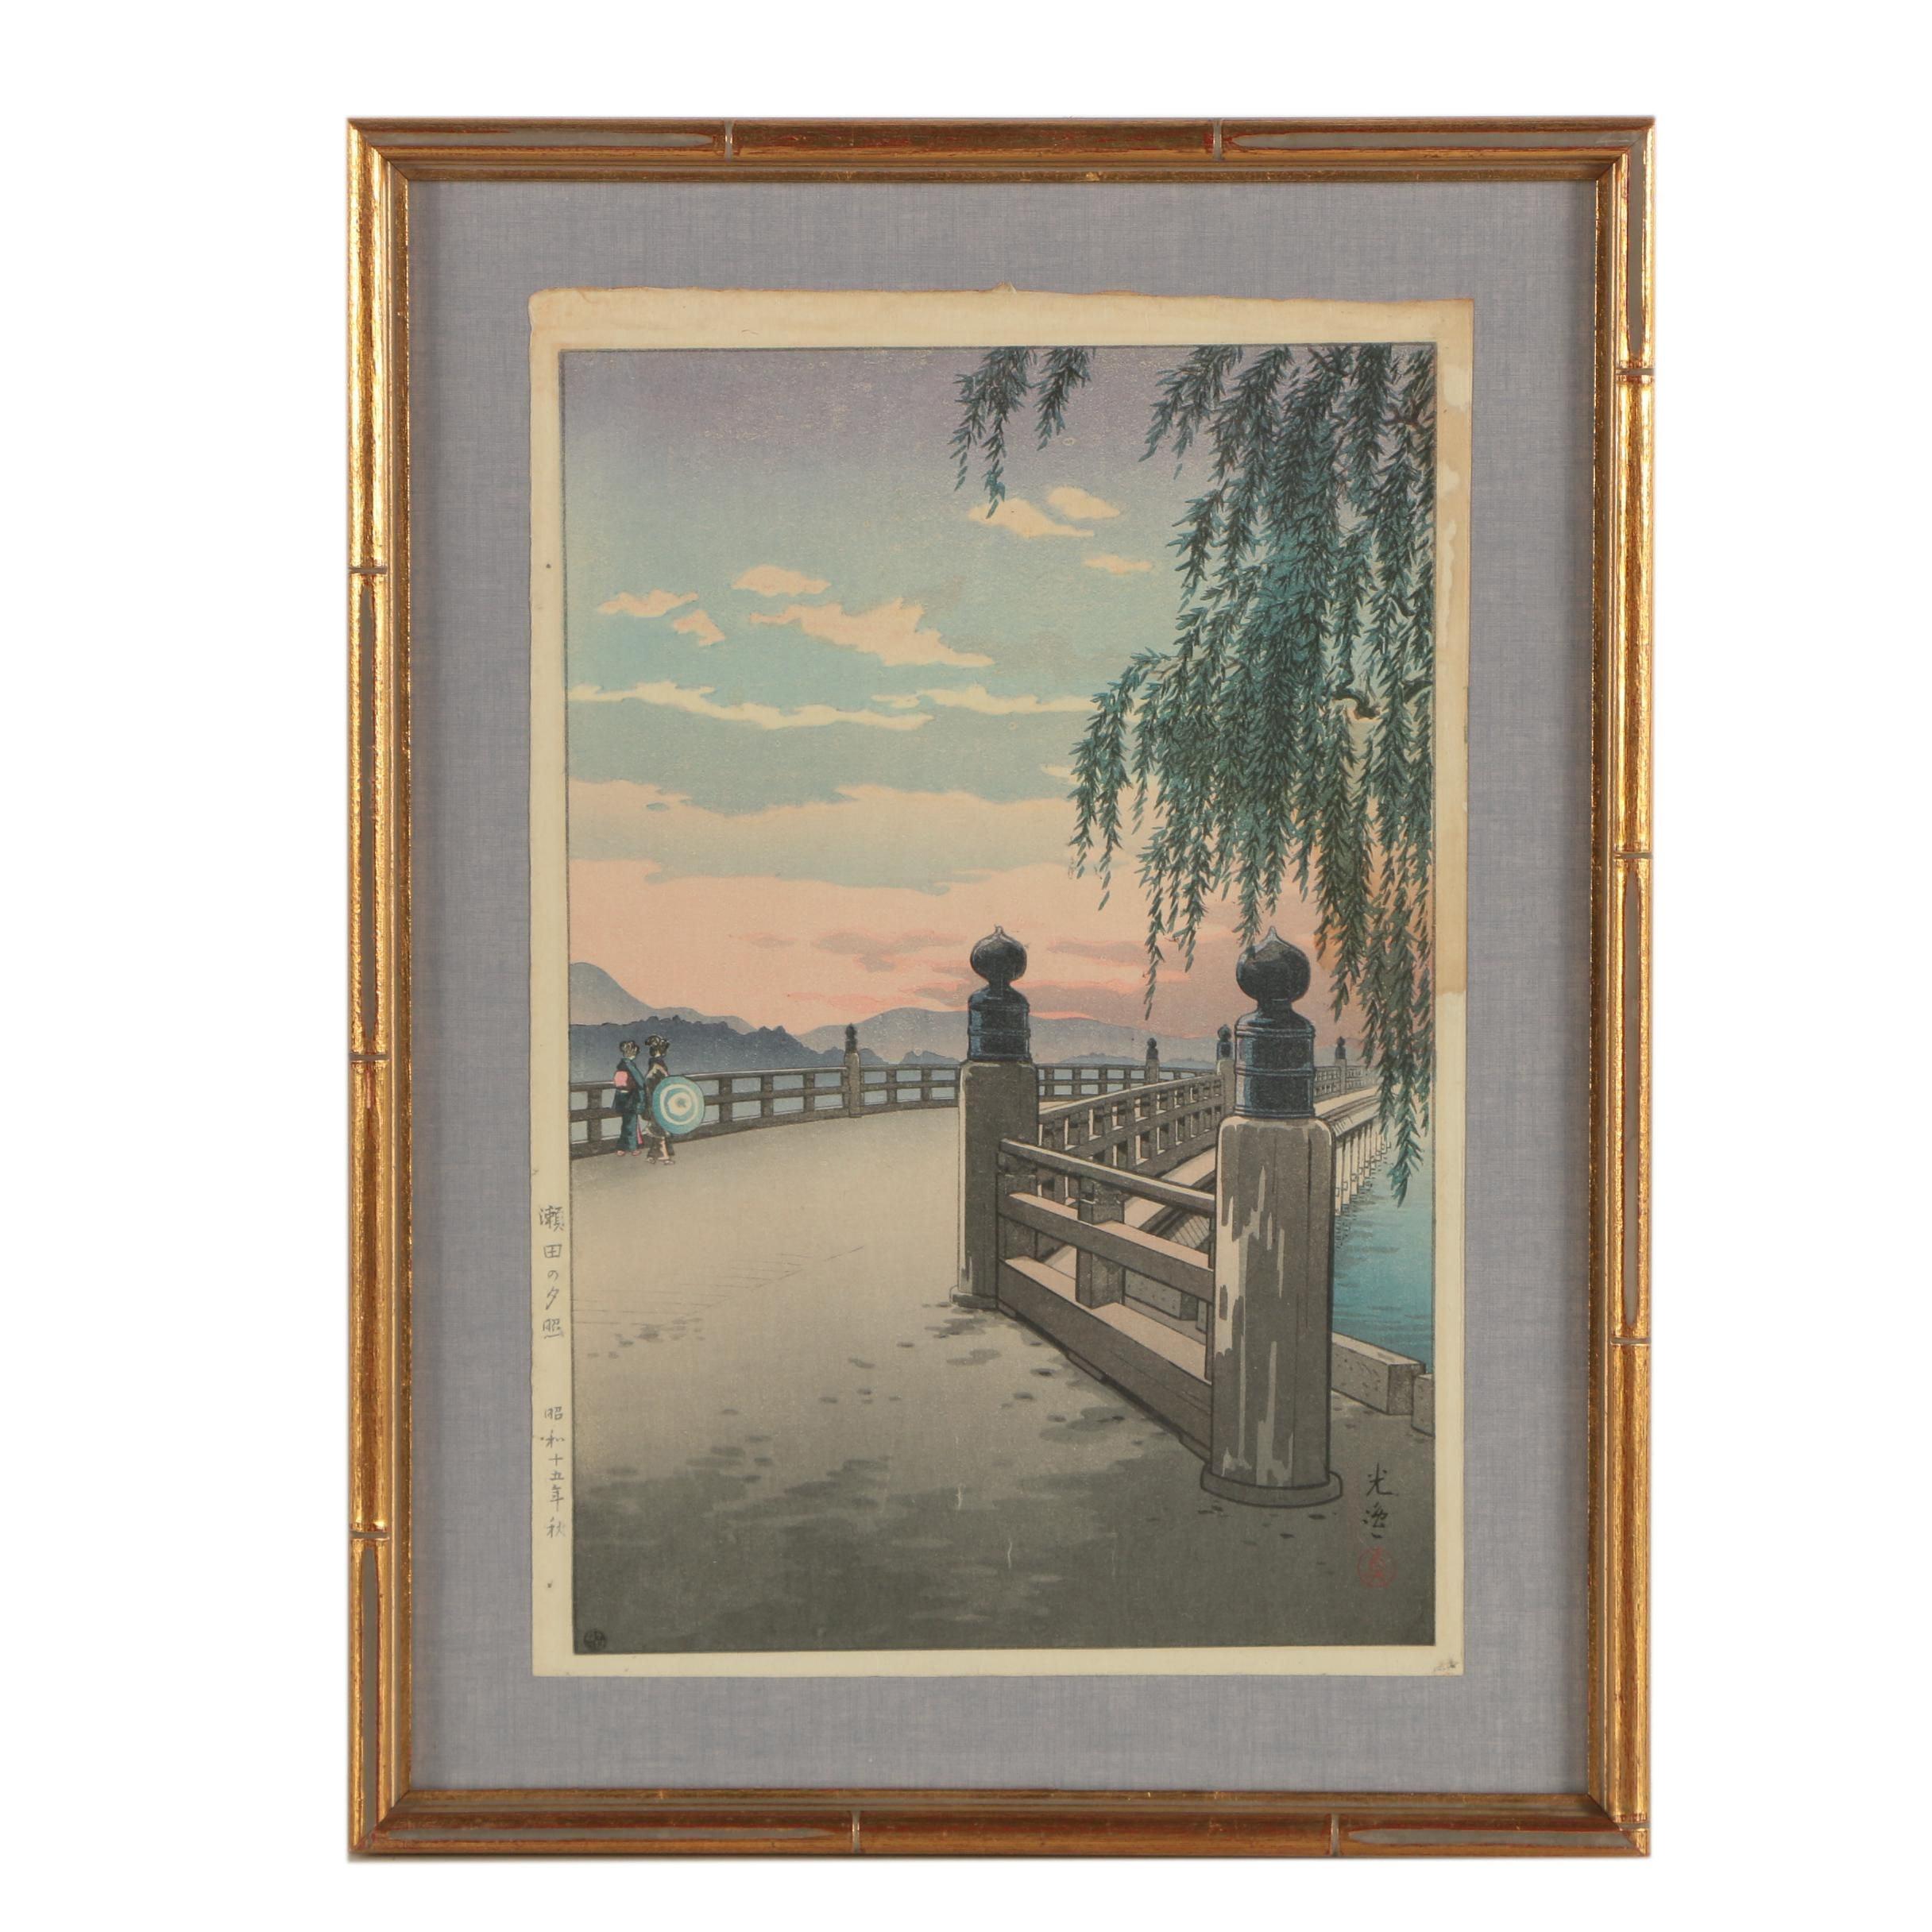 "Tsuchiya Koitsu ""Sunset Glow at Seta Bridge"" Shin-Hanga Woodblock Print"